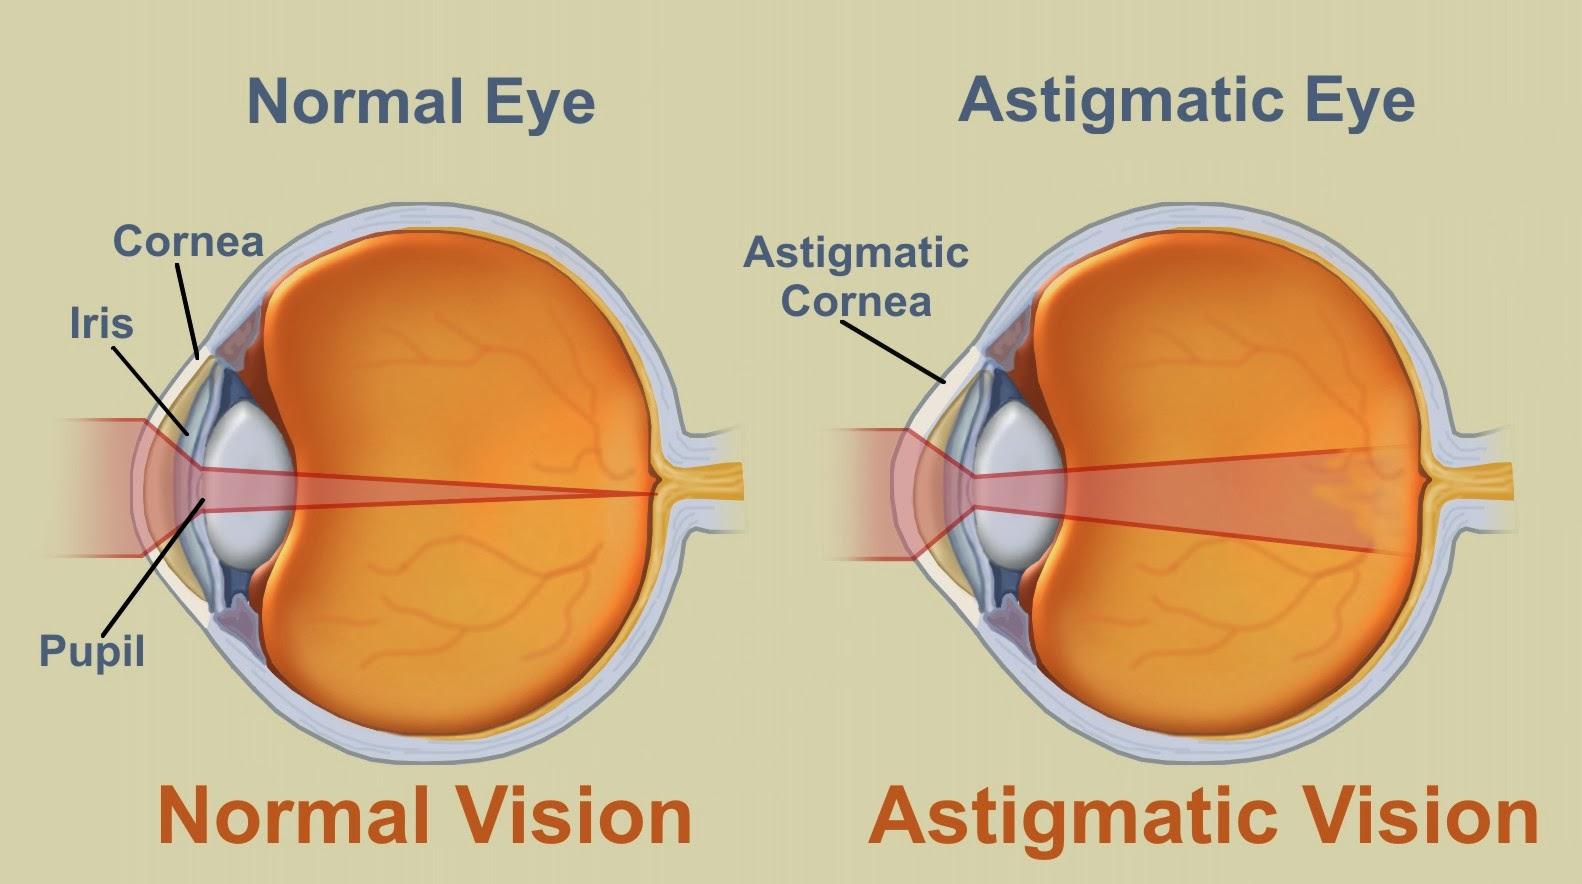 astigmatism causes, symptoms, diagnosis, treatment, prevention, Cephalic Vein